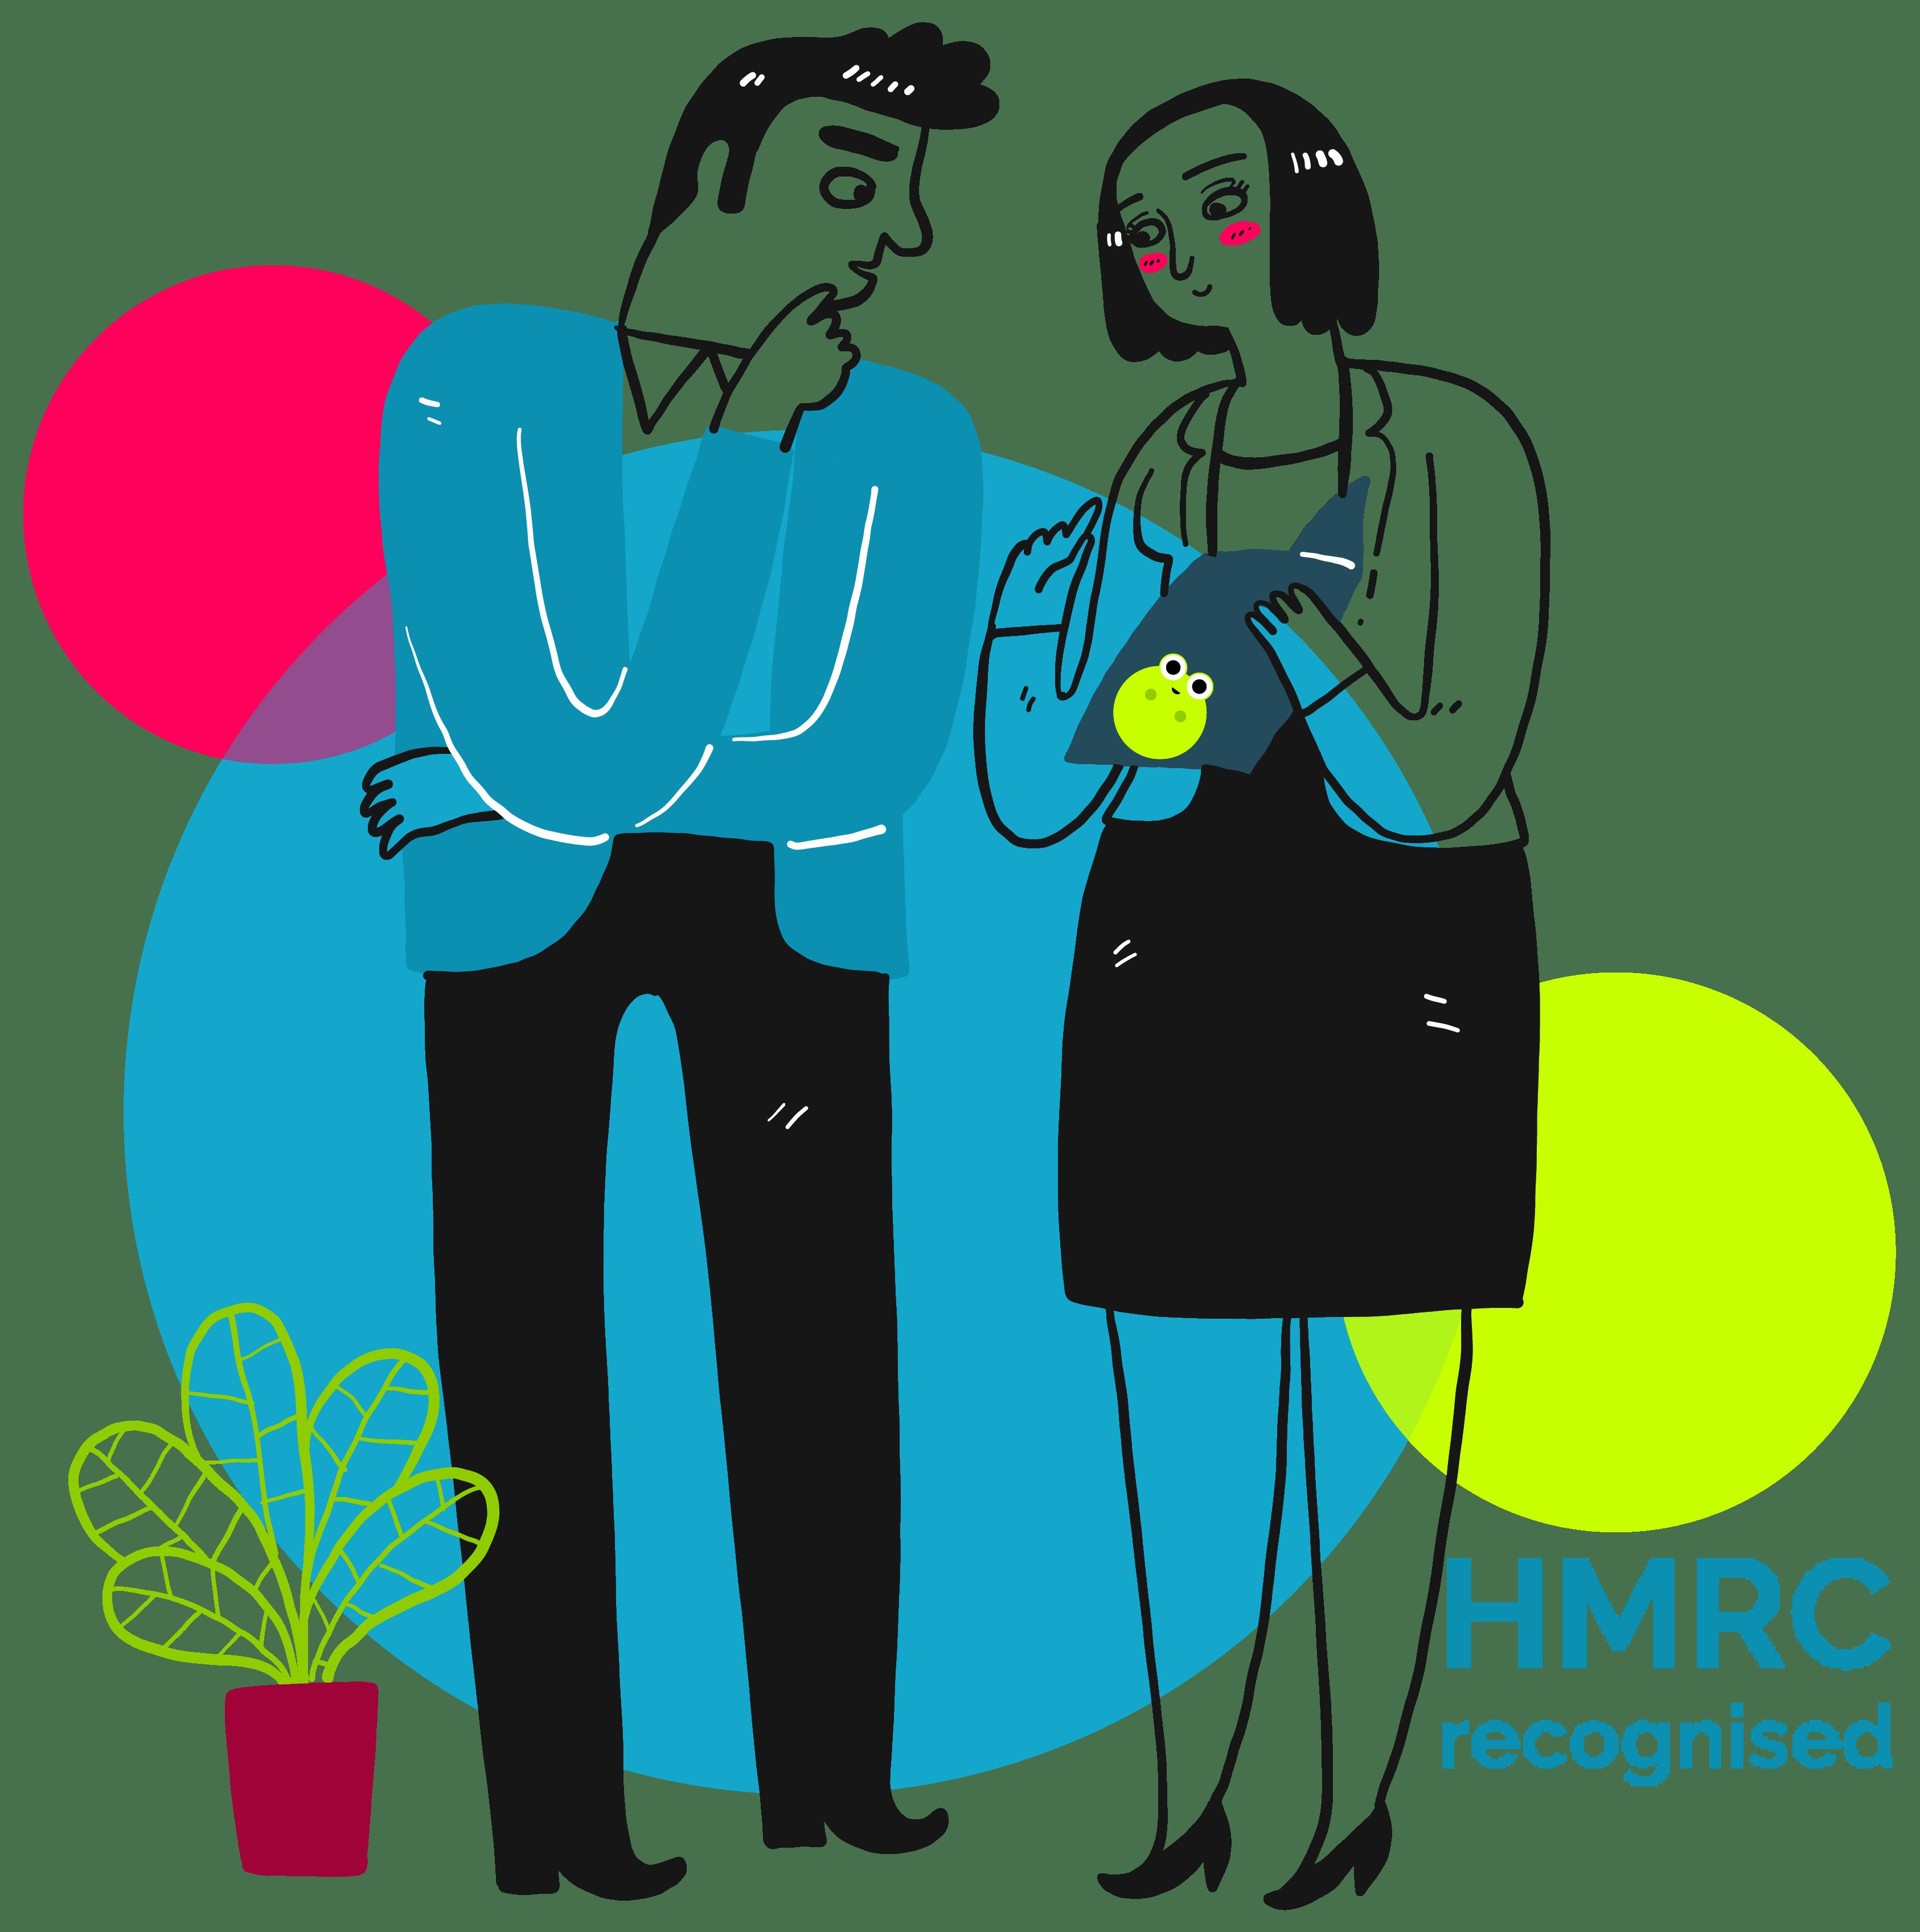 Explaining MTD - Accountants - HMRC recognised